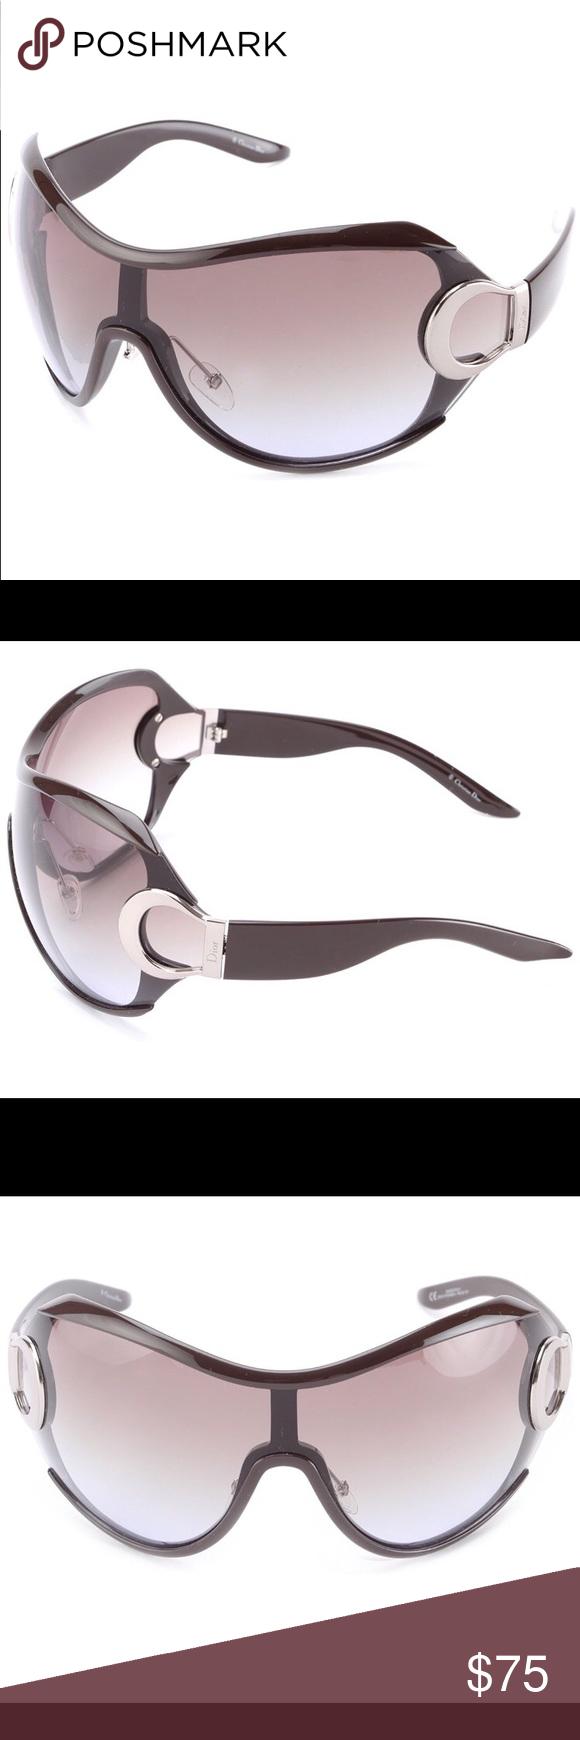 8003315c7cf3 Christian Dior Stronger 2 Sunglasses Christian Dior Stronger 2 Sunglasses  Like new! Brown Dior Accessories Sunglasses